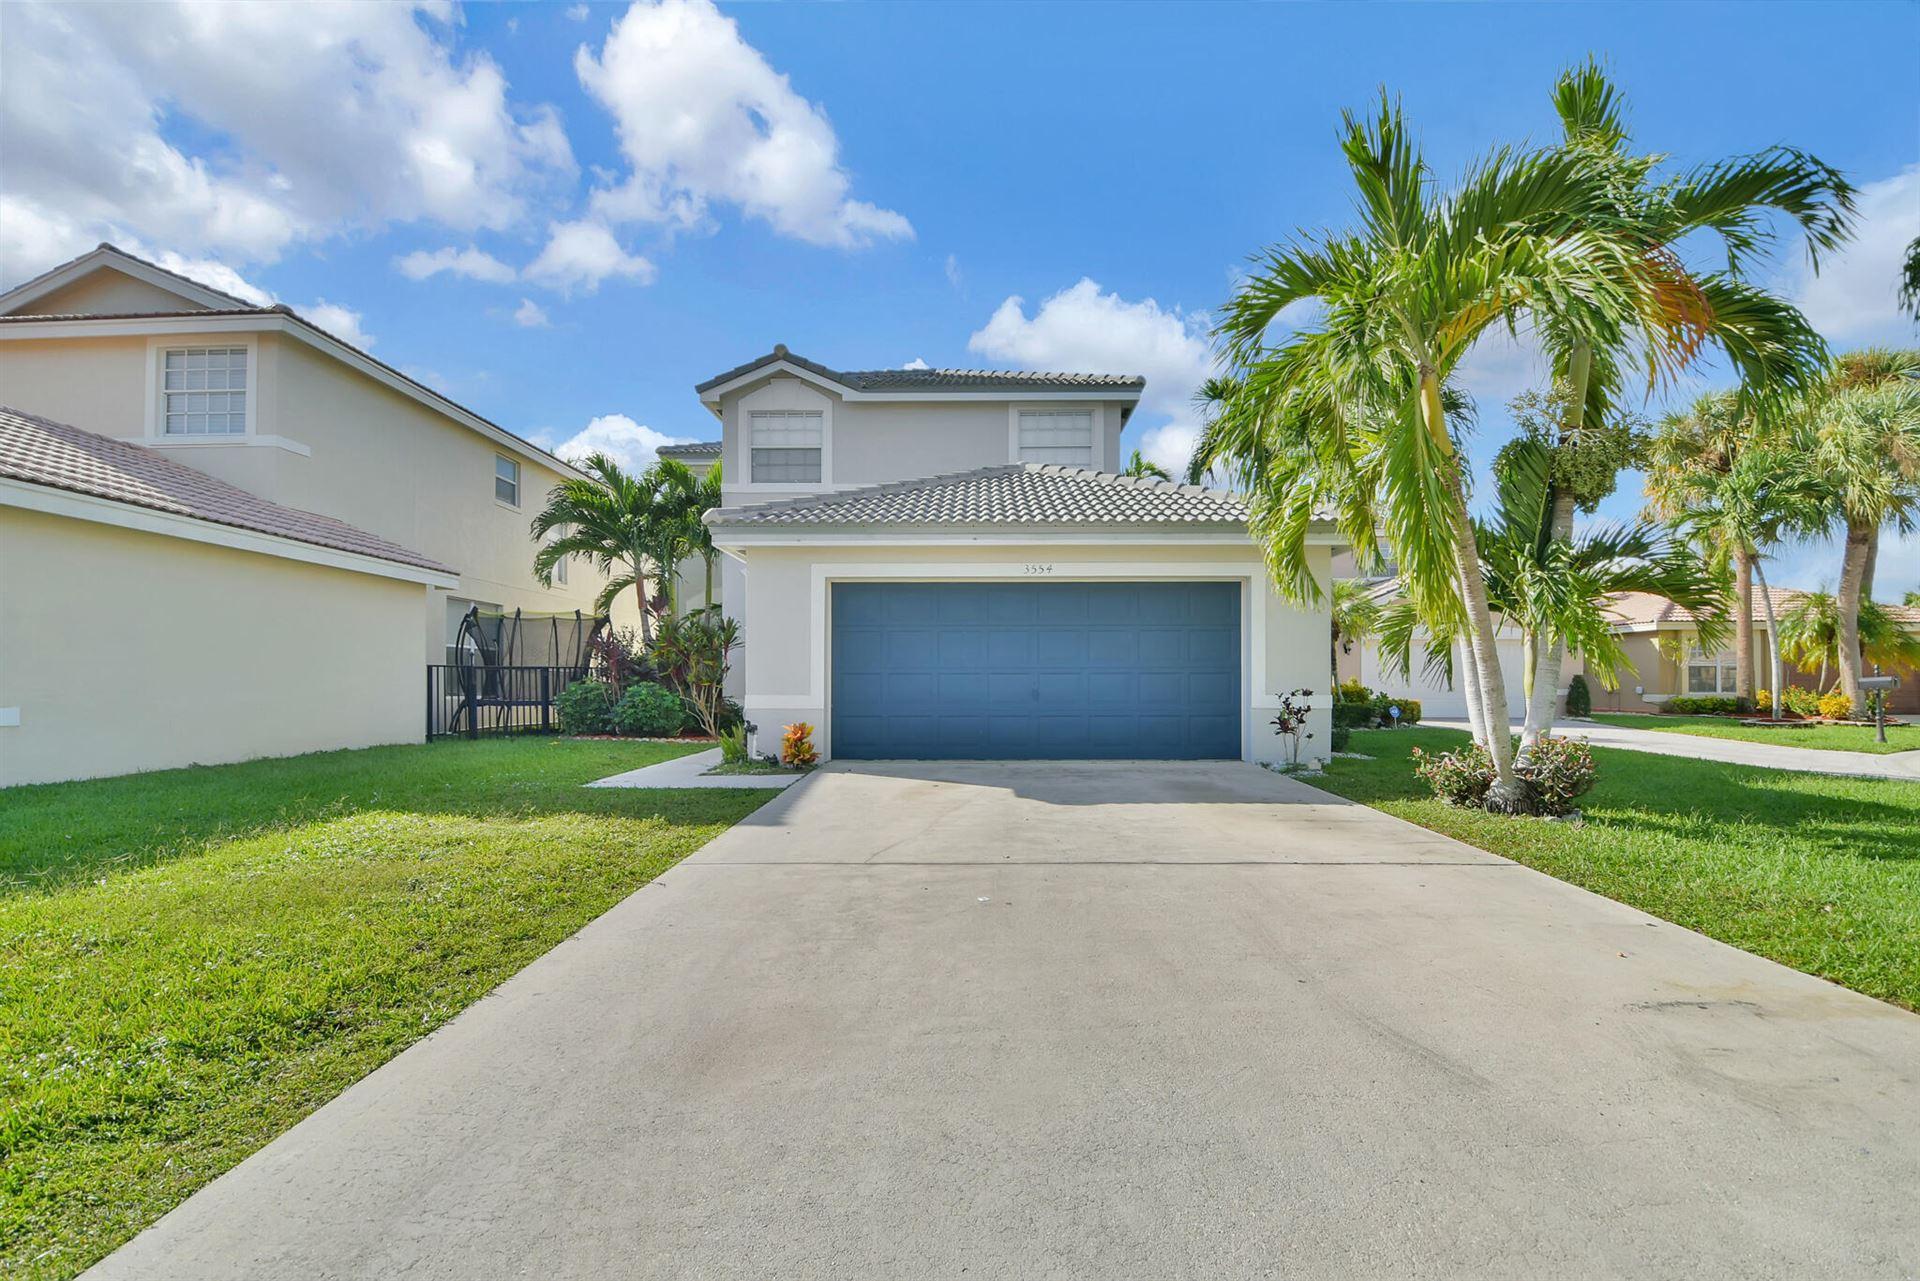 3554 Danbury Court, Boynton Beach, FL 33436 - #: RX-10754684